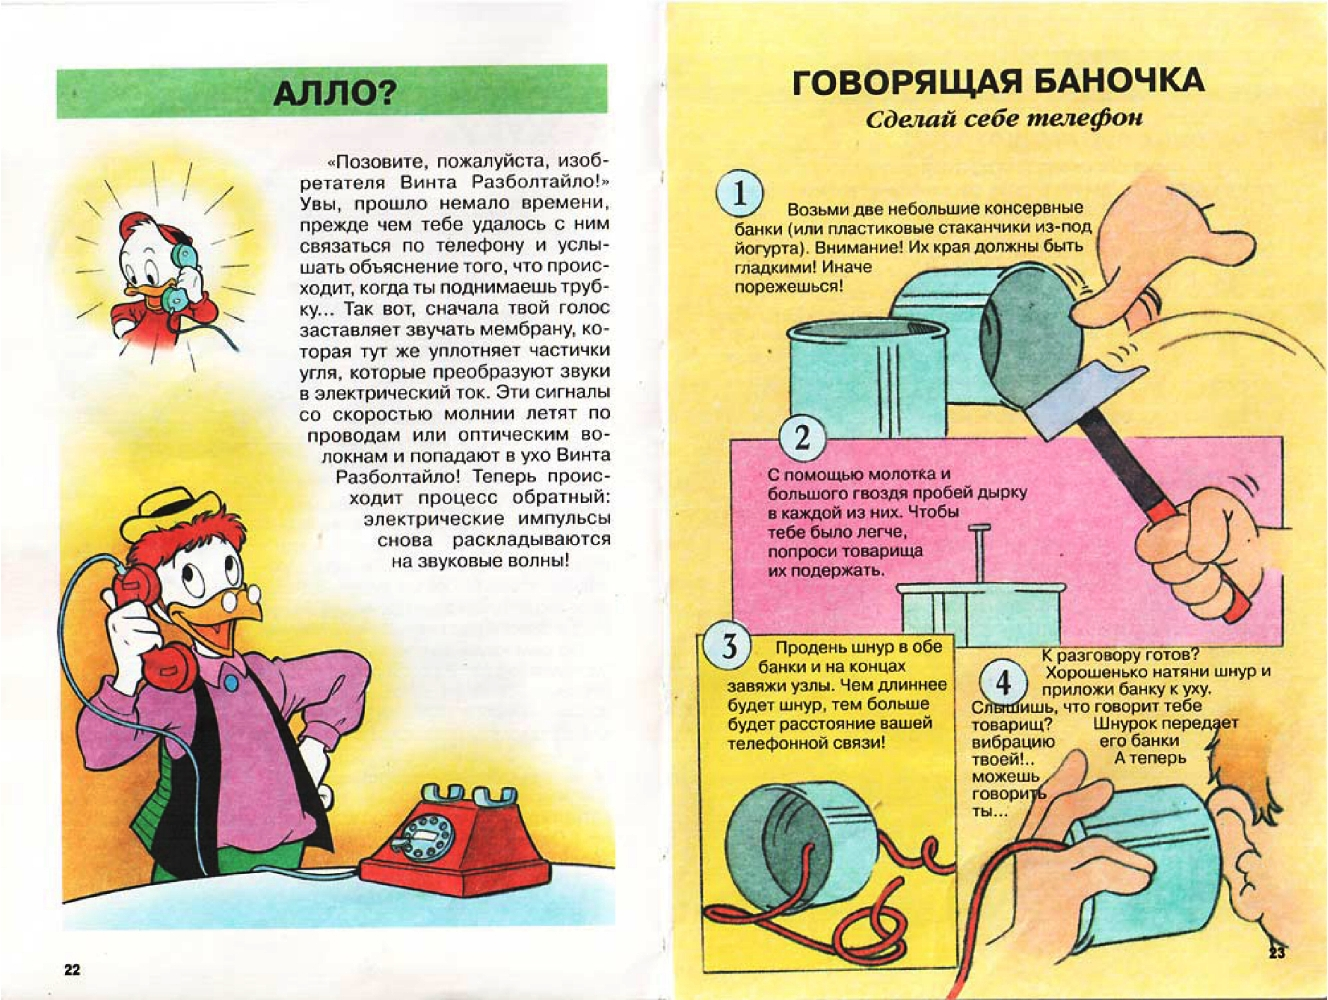 http://i4.imageban.ru/out/2013/12/06/9bcb463d5d0c0c54027a143d02f1d8c3.jpg